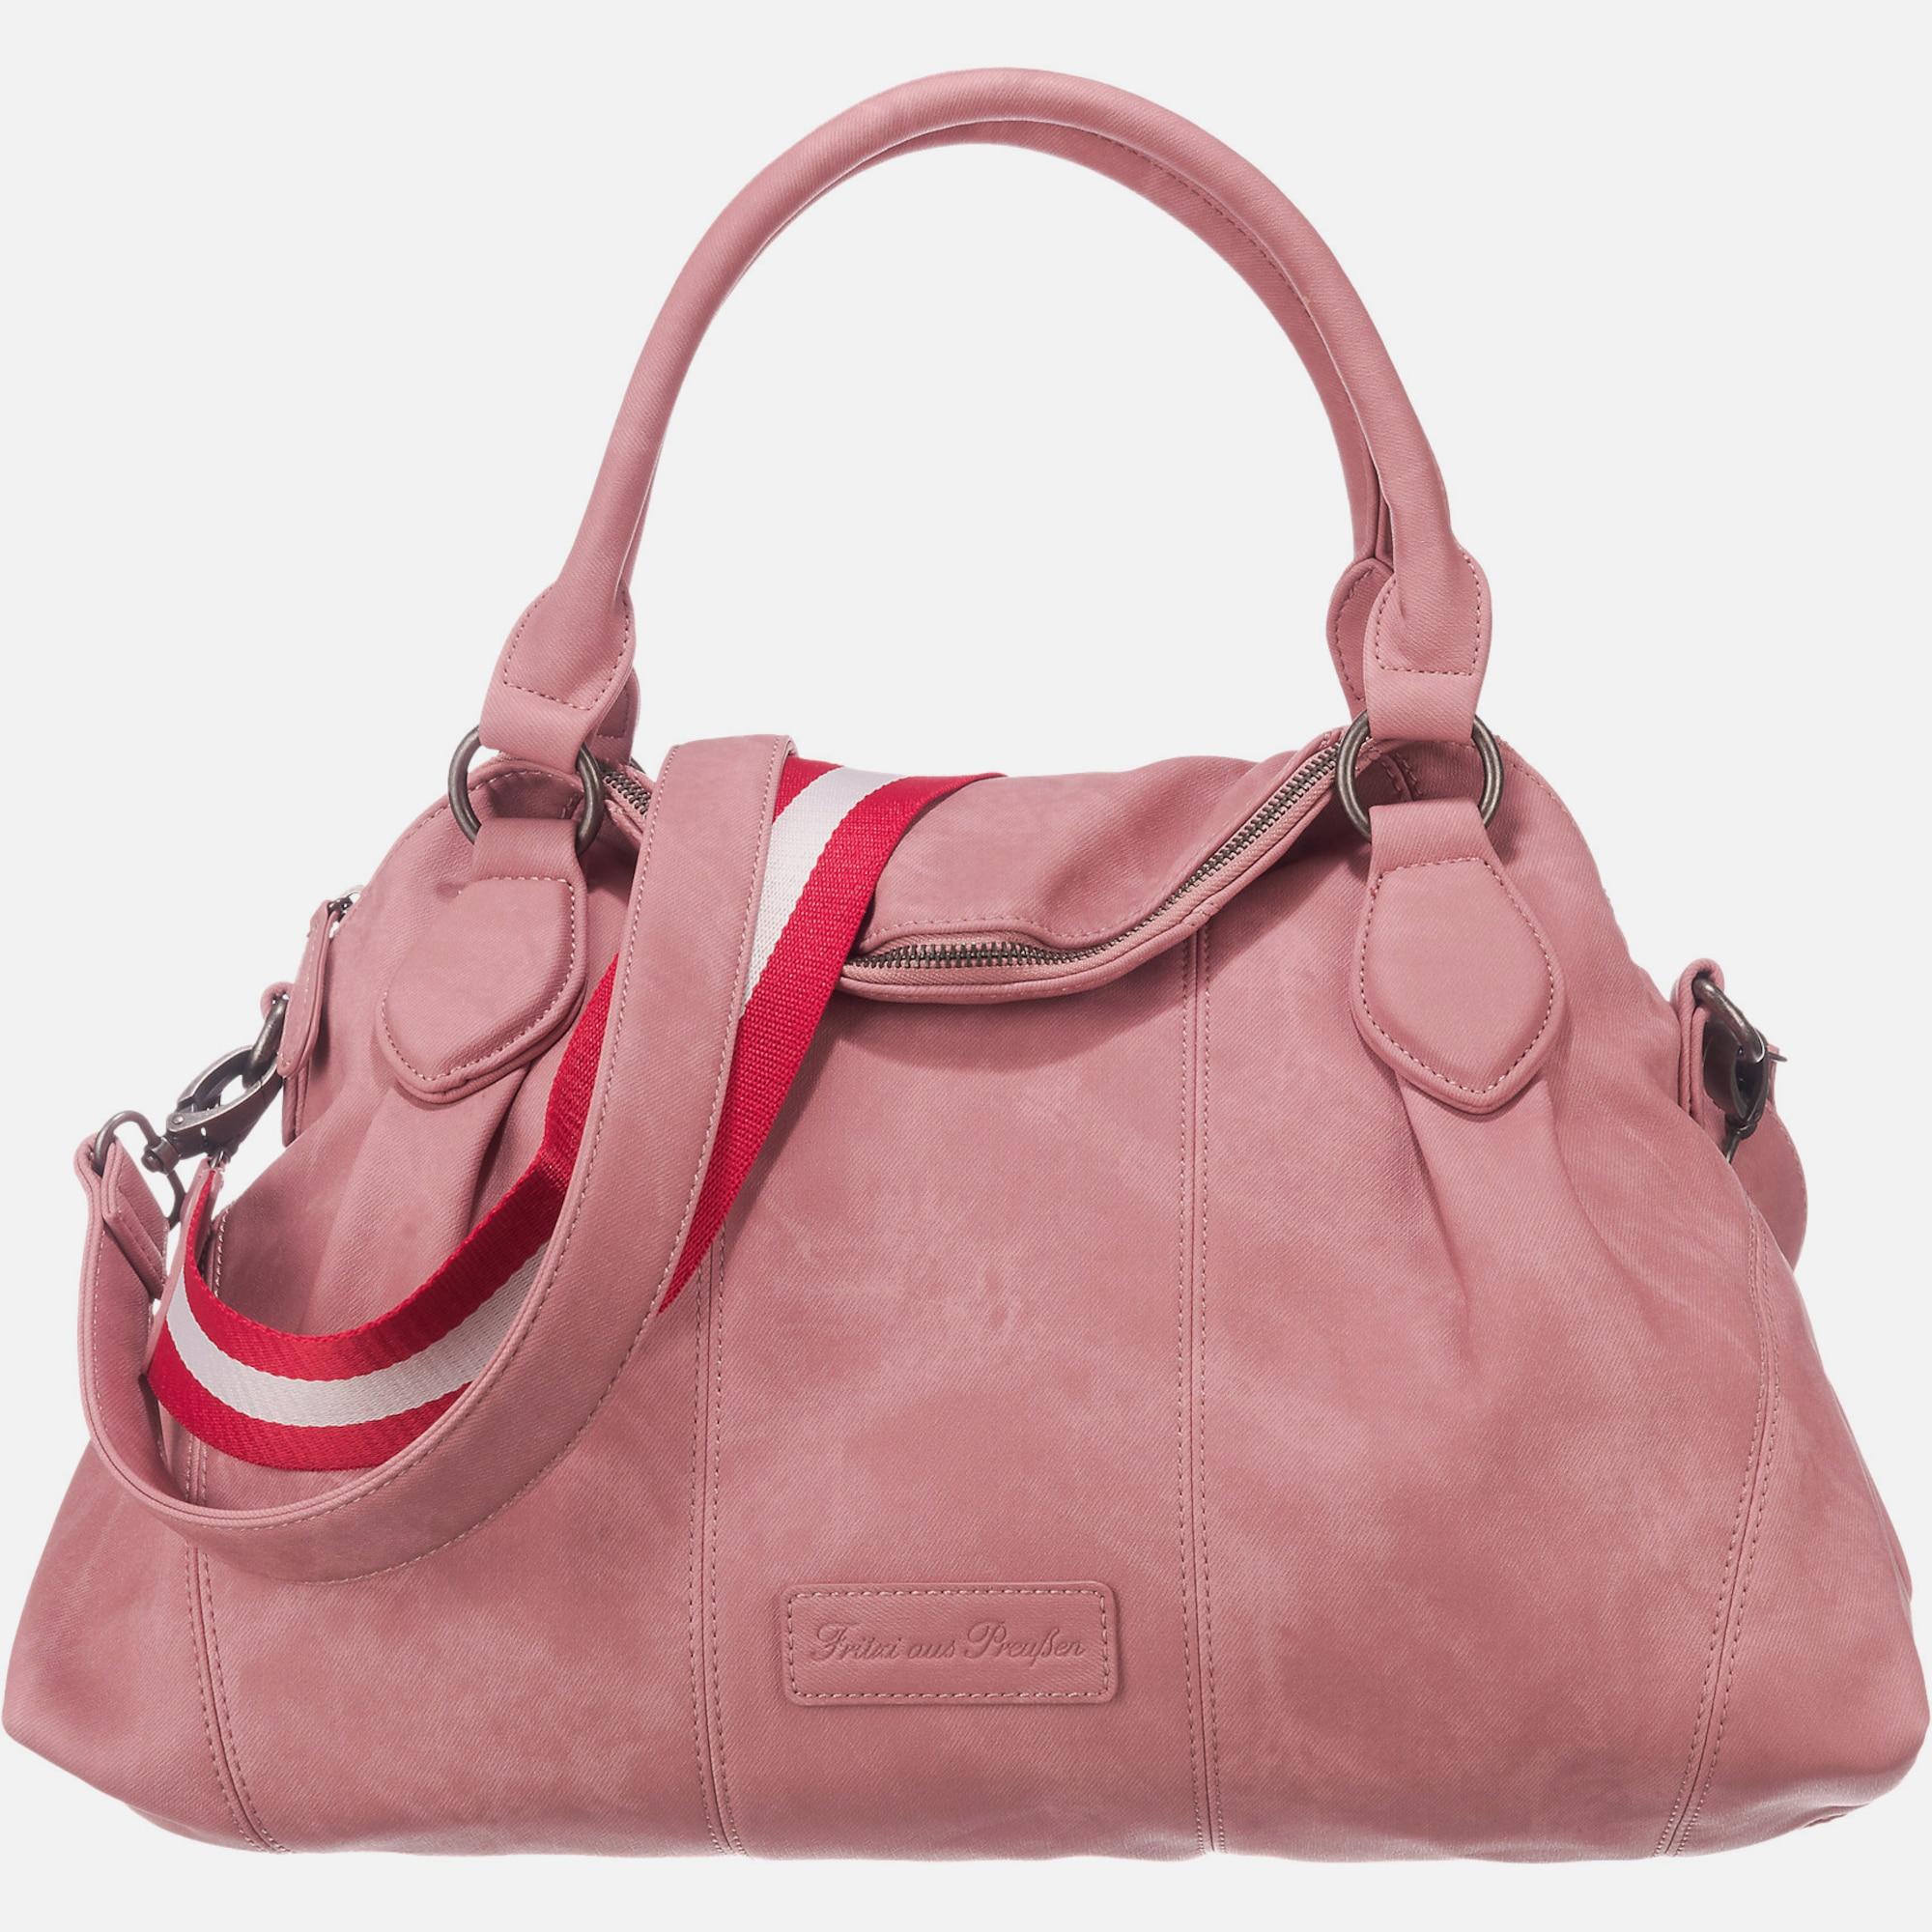 fritzi aus preu en wanda handtasche in pink about you. Black Bedroom Furniture Sets. Home Design Ideas